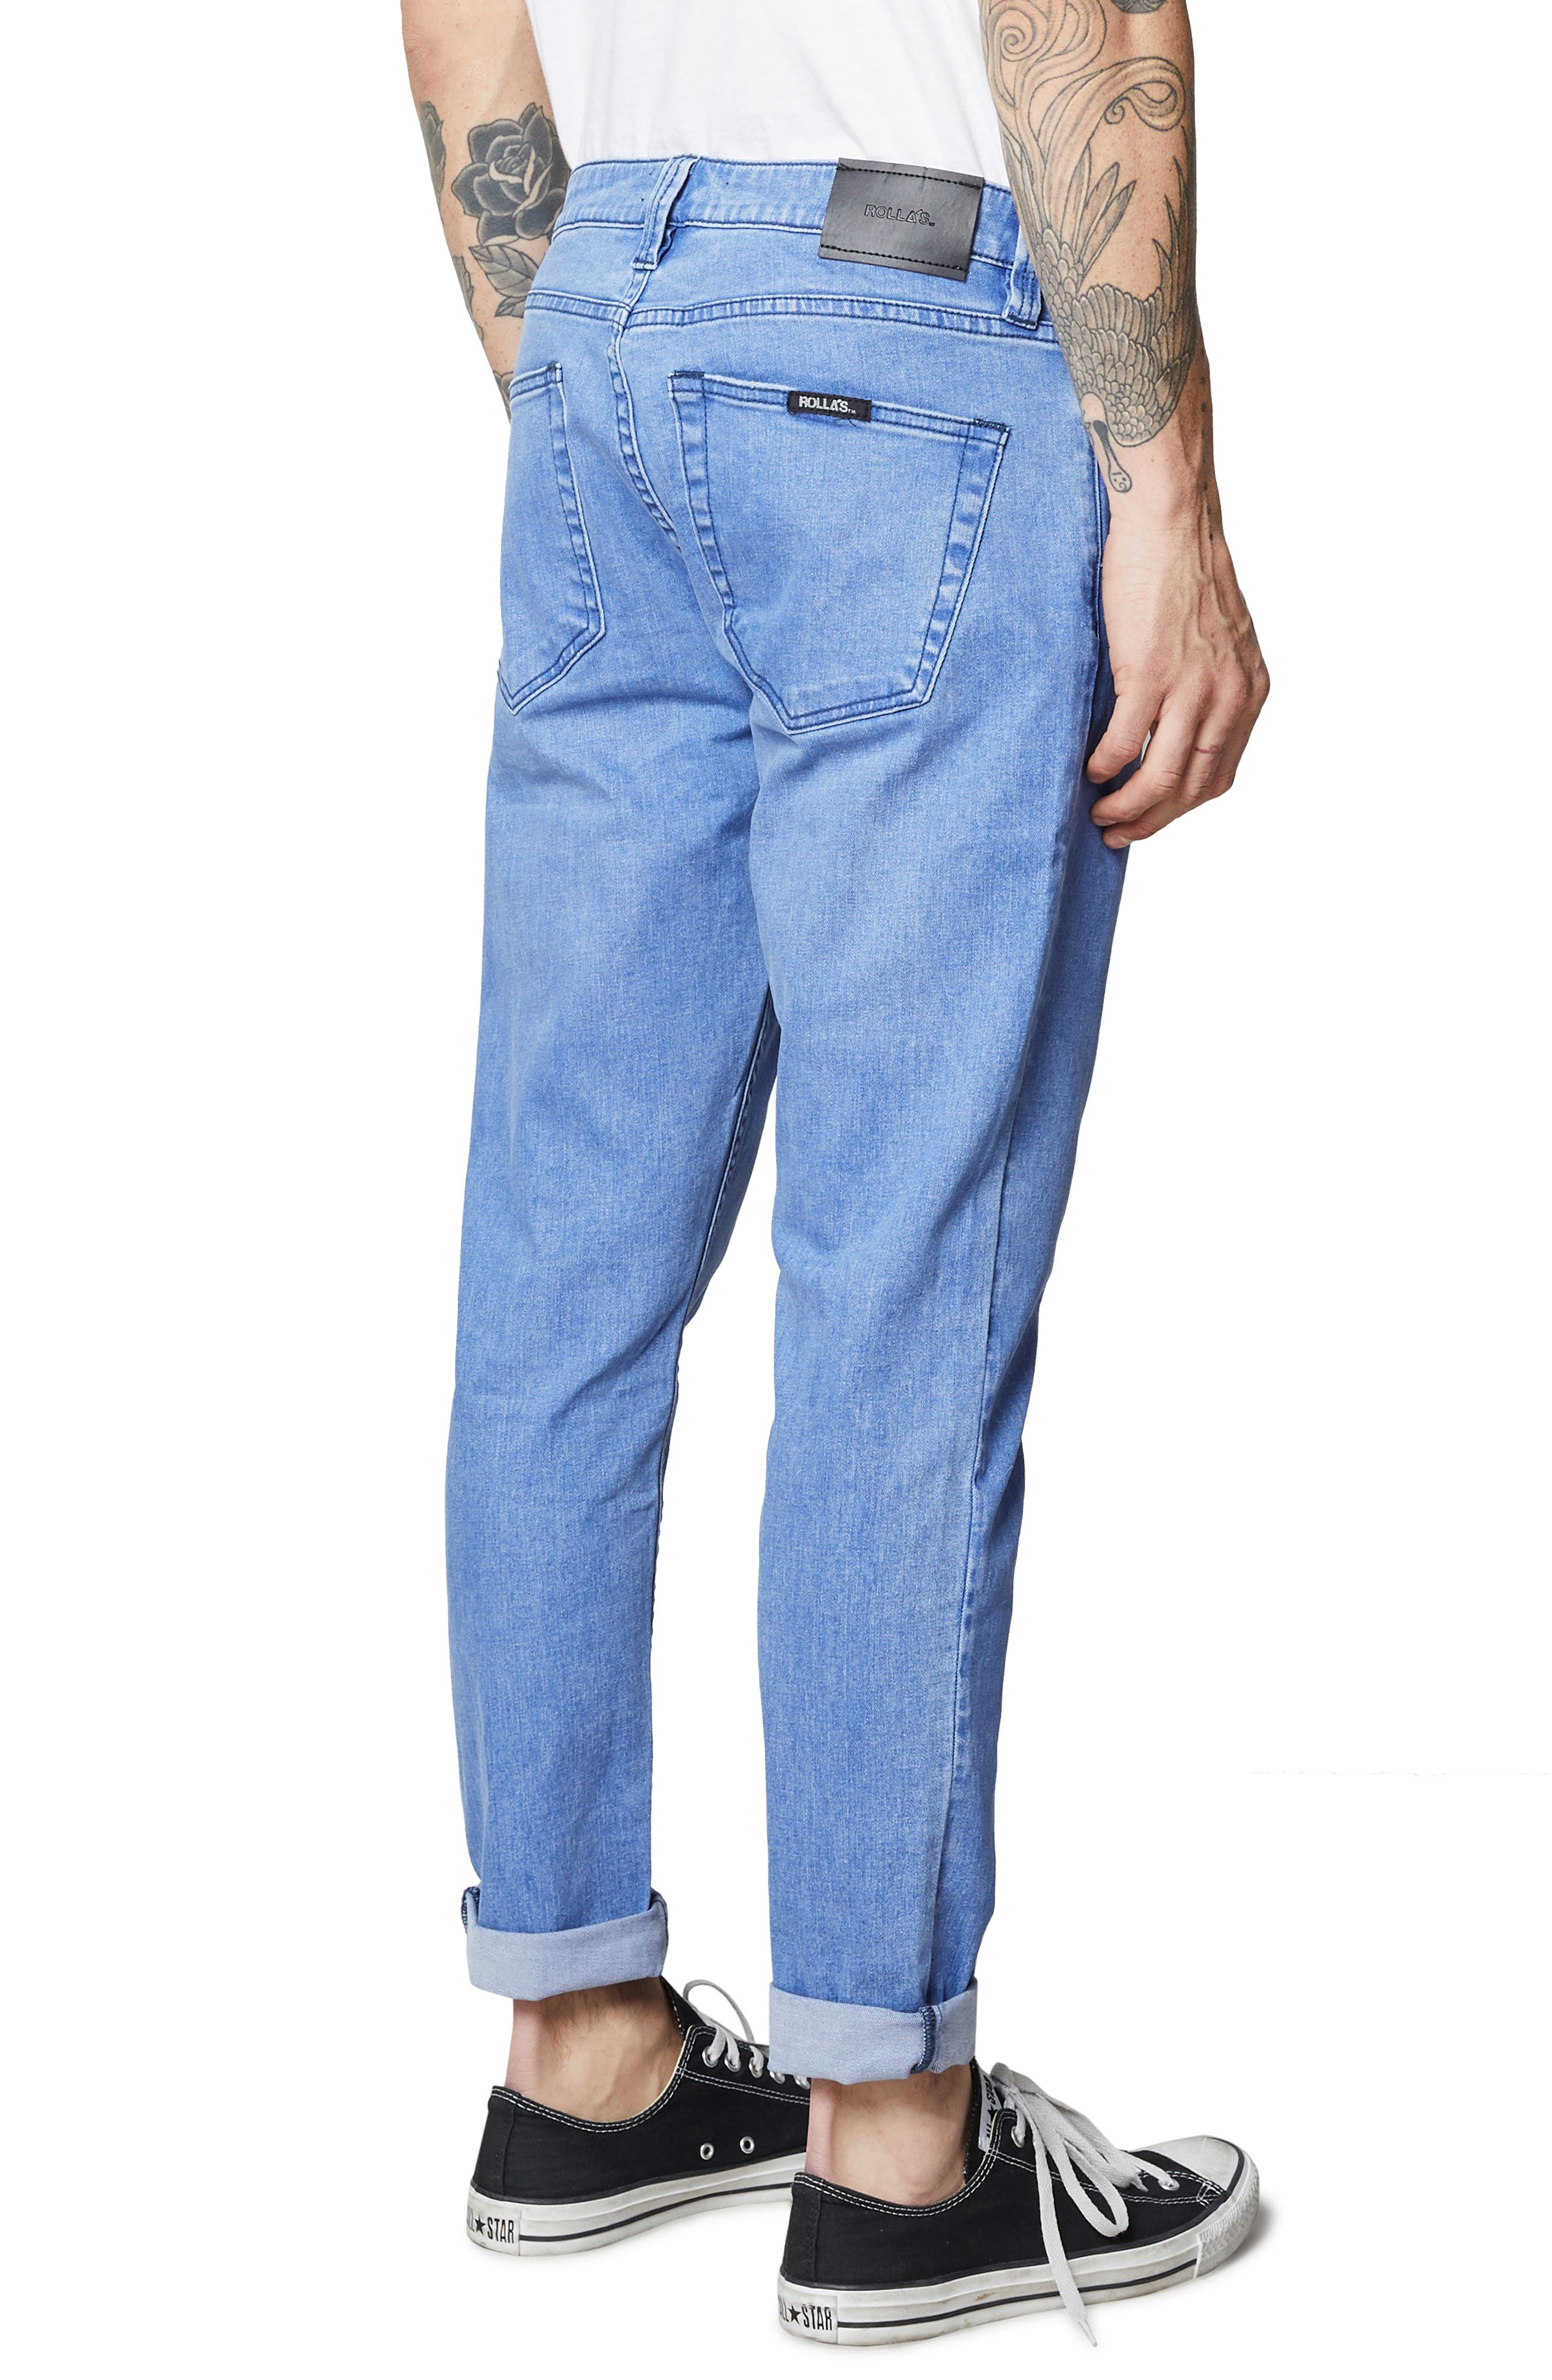 Rollies Slim Fit Jeans,                             Alternate thumbnail 7, color,                             BOLD BLUE